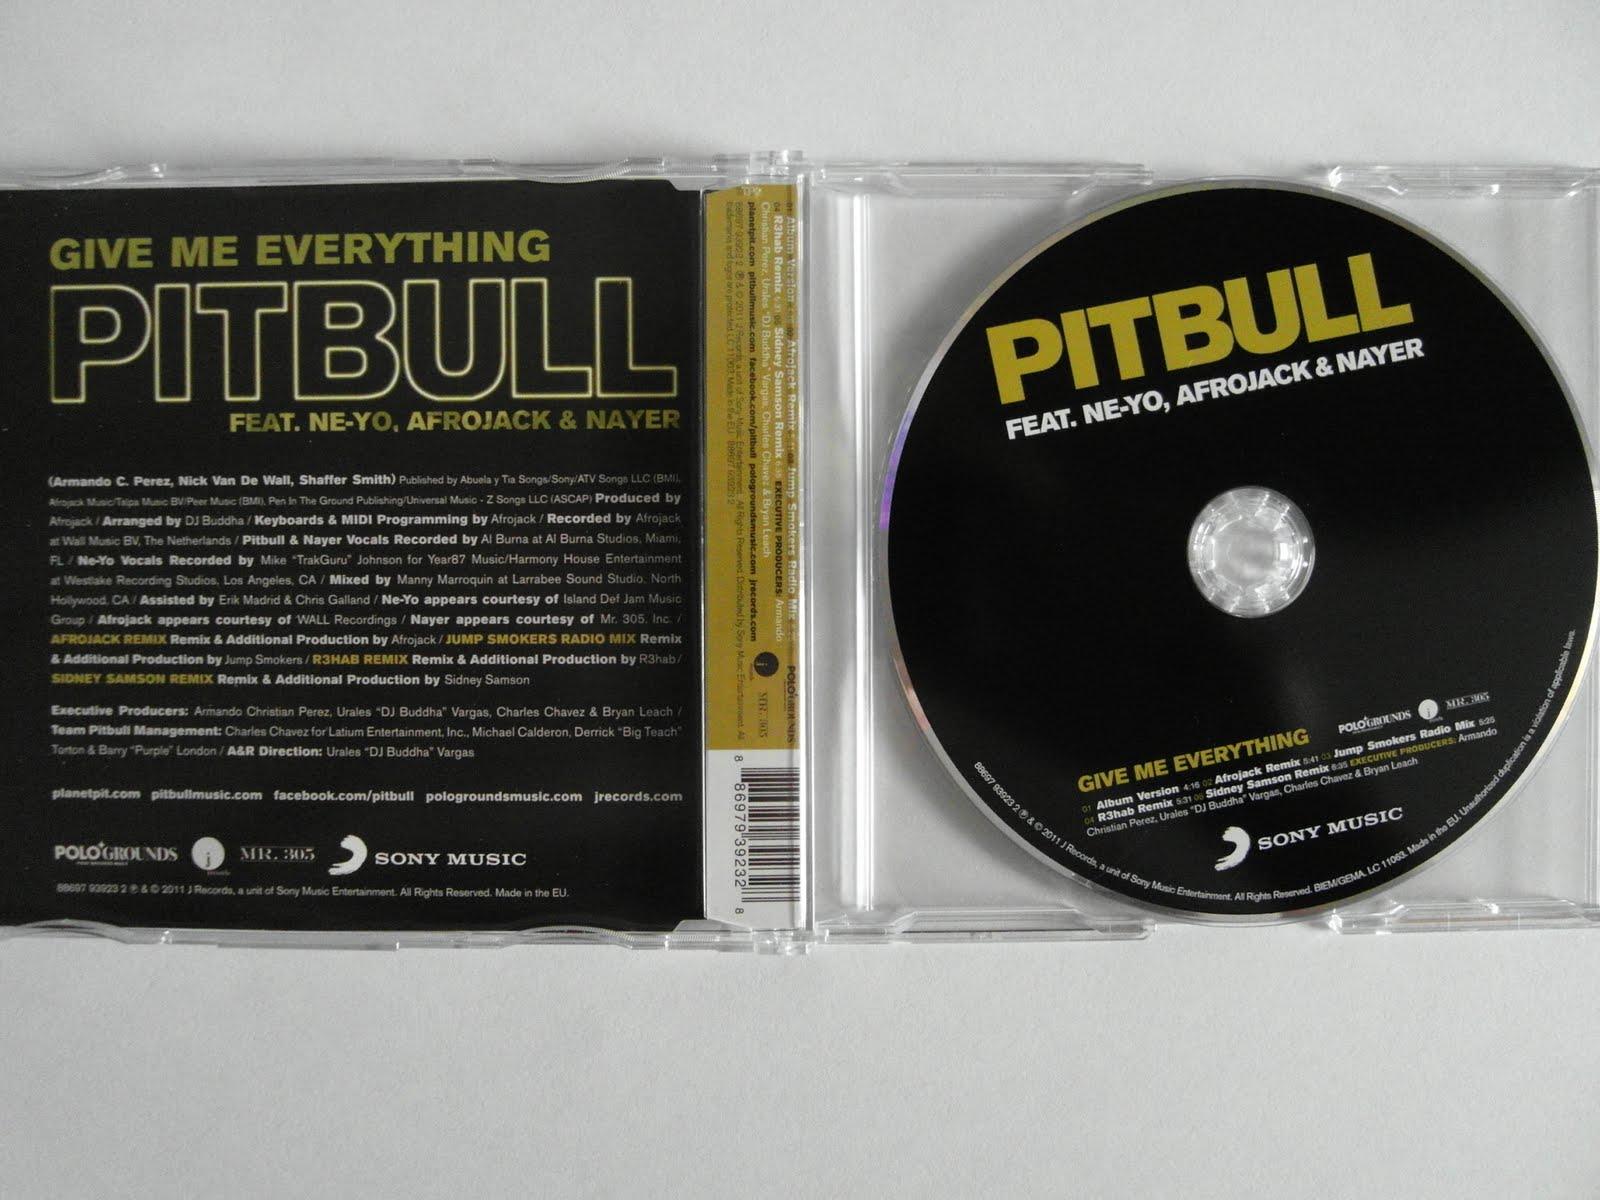 http://1.bp.blogspot.com/-PxEvsbMYJws/TgyUtgZYyyI/AAAAAAAAKuI/EPOtz2A-Sp8/s1600/00-pitbull_feat_ne-yo_afrojack_and_nayer_-_give_me_everything__incl_sidney_samson_remix-cdm-2011-cover.jpg